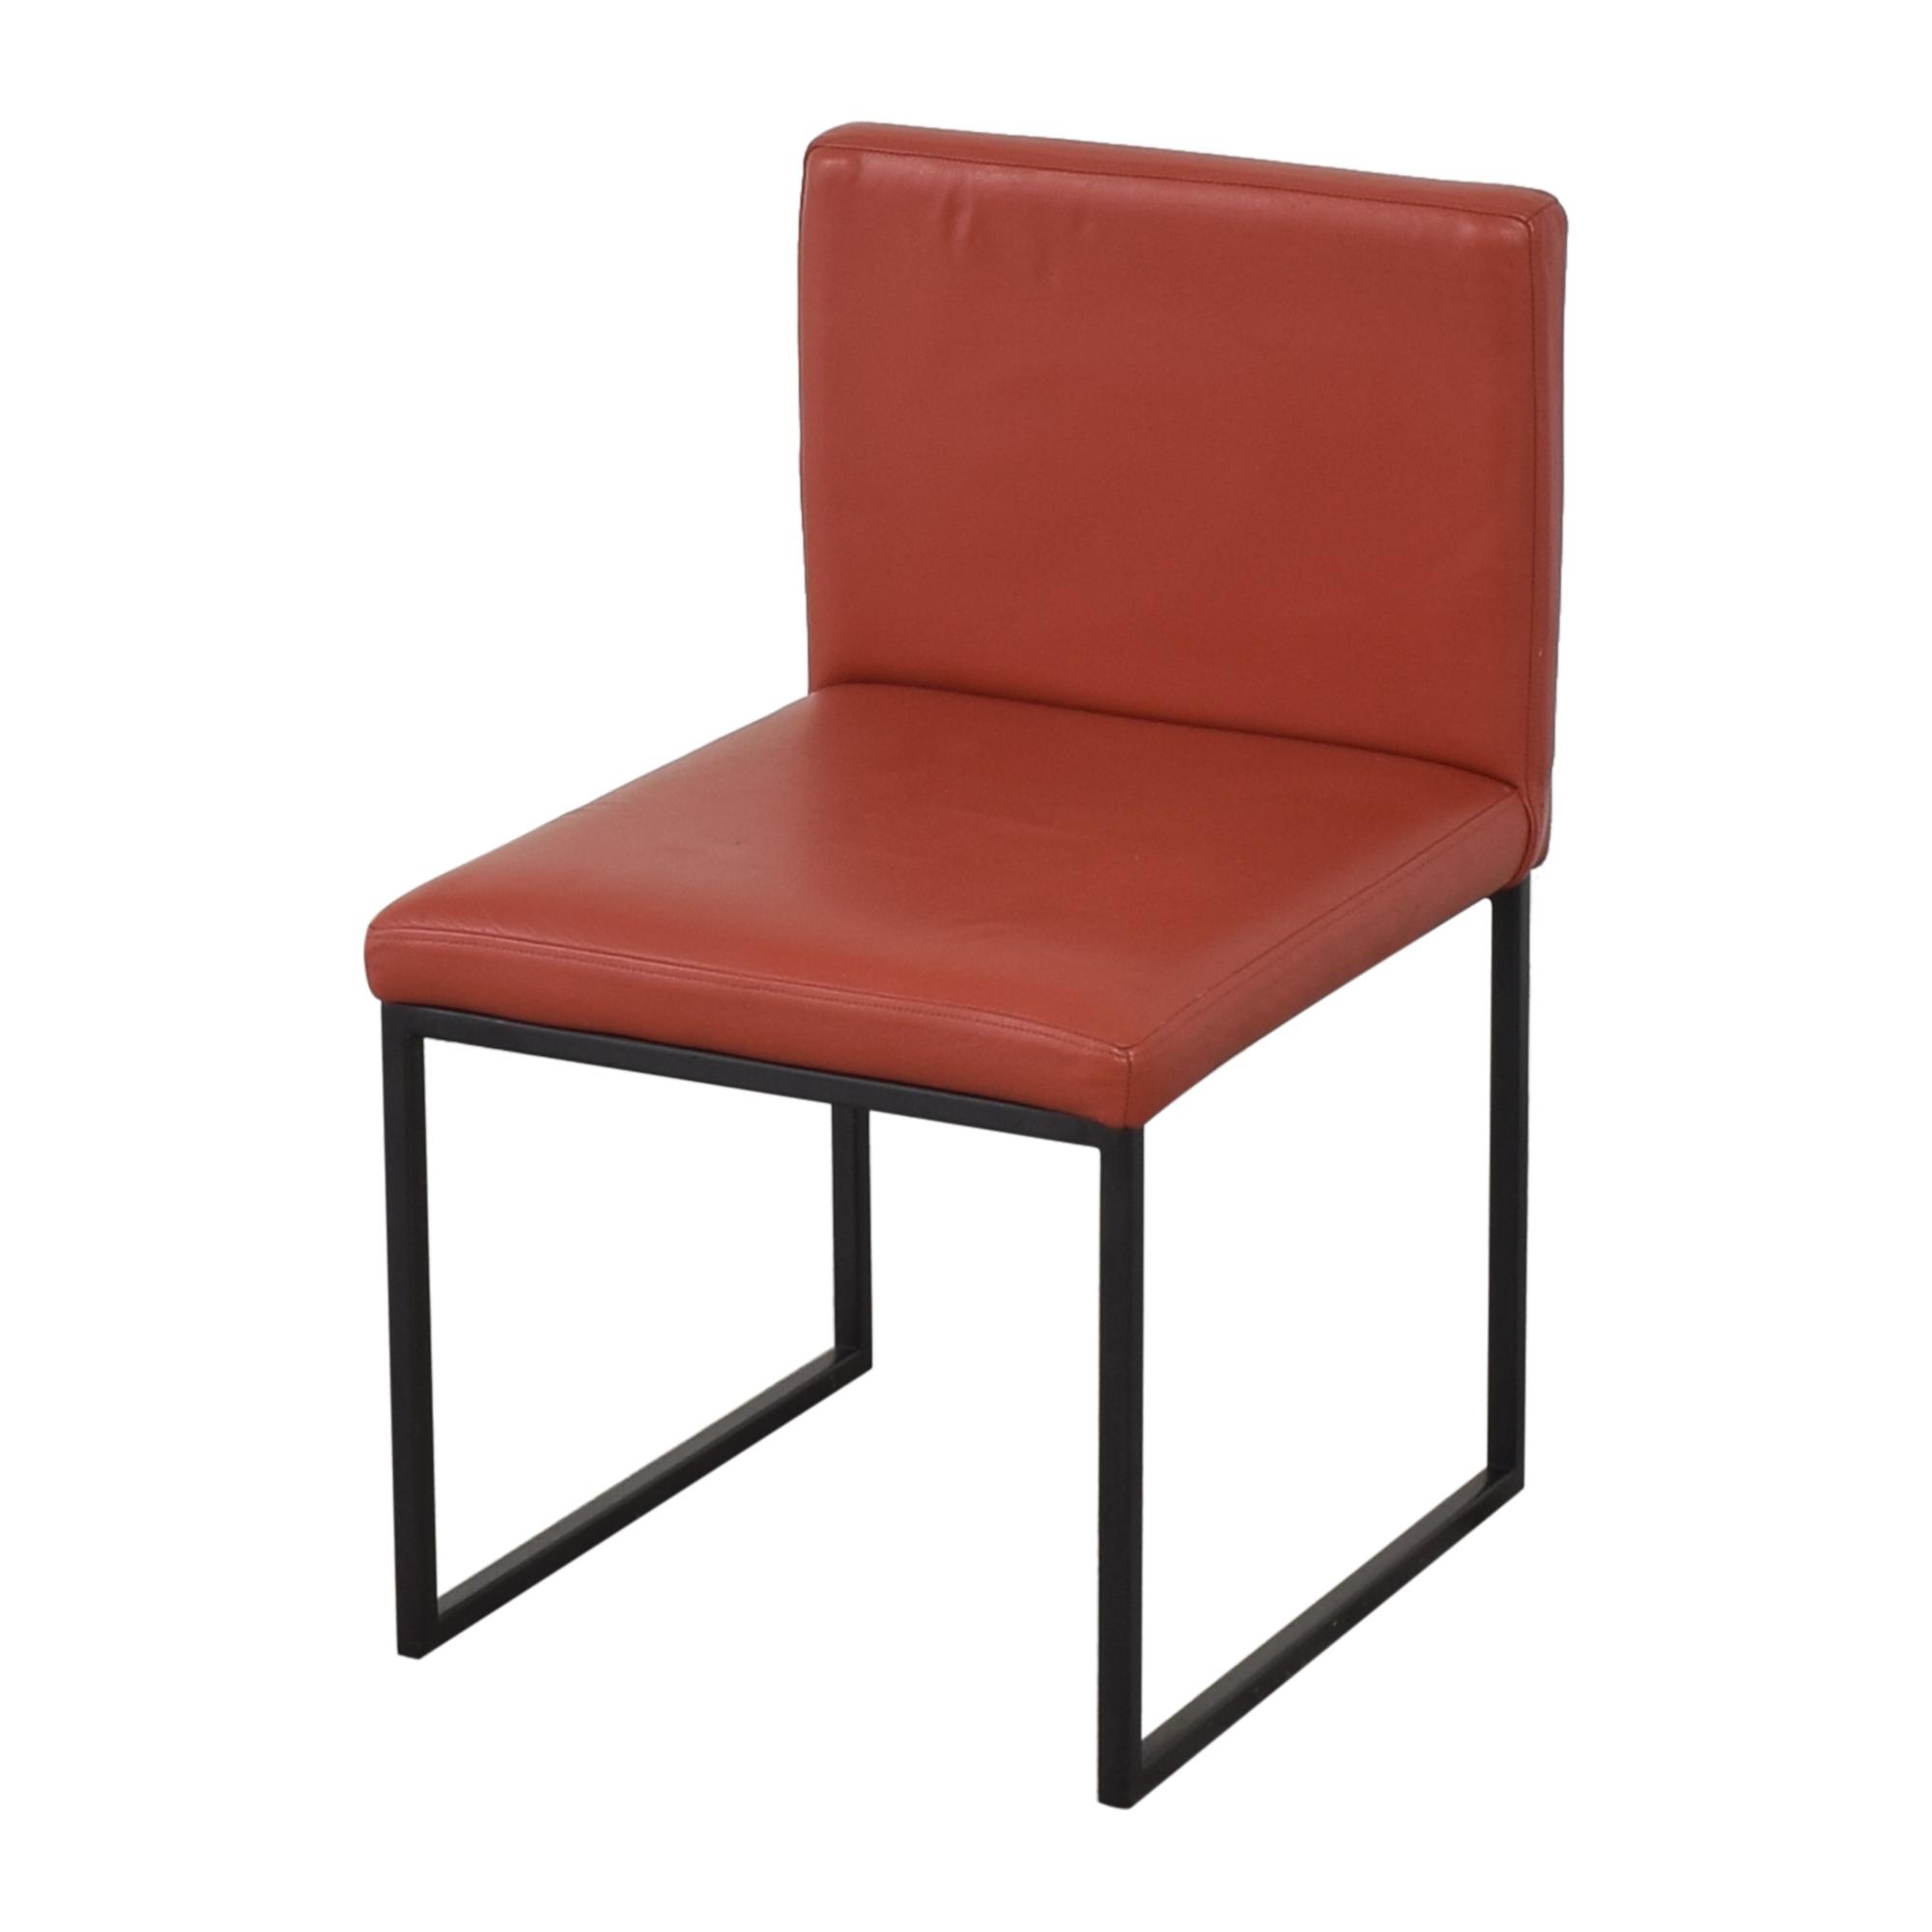 Desiron Desiron Suffolk Dining Chair nj